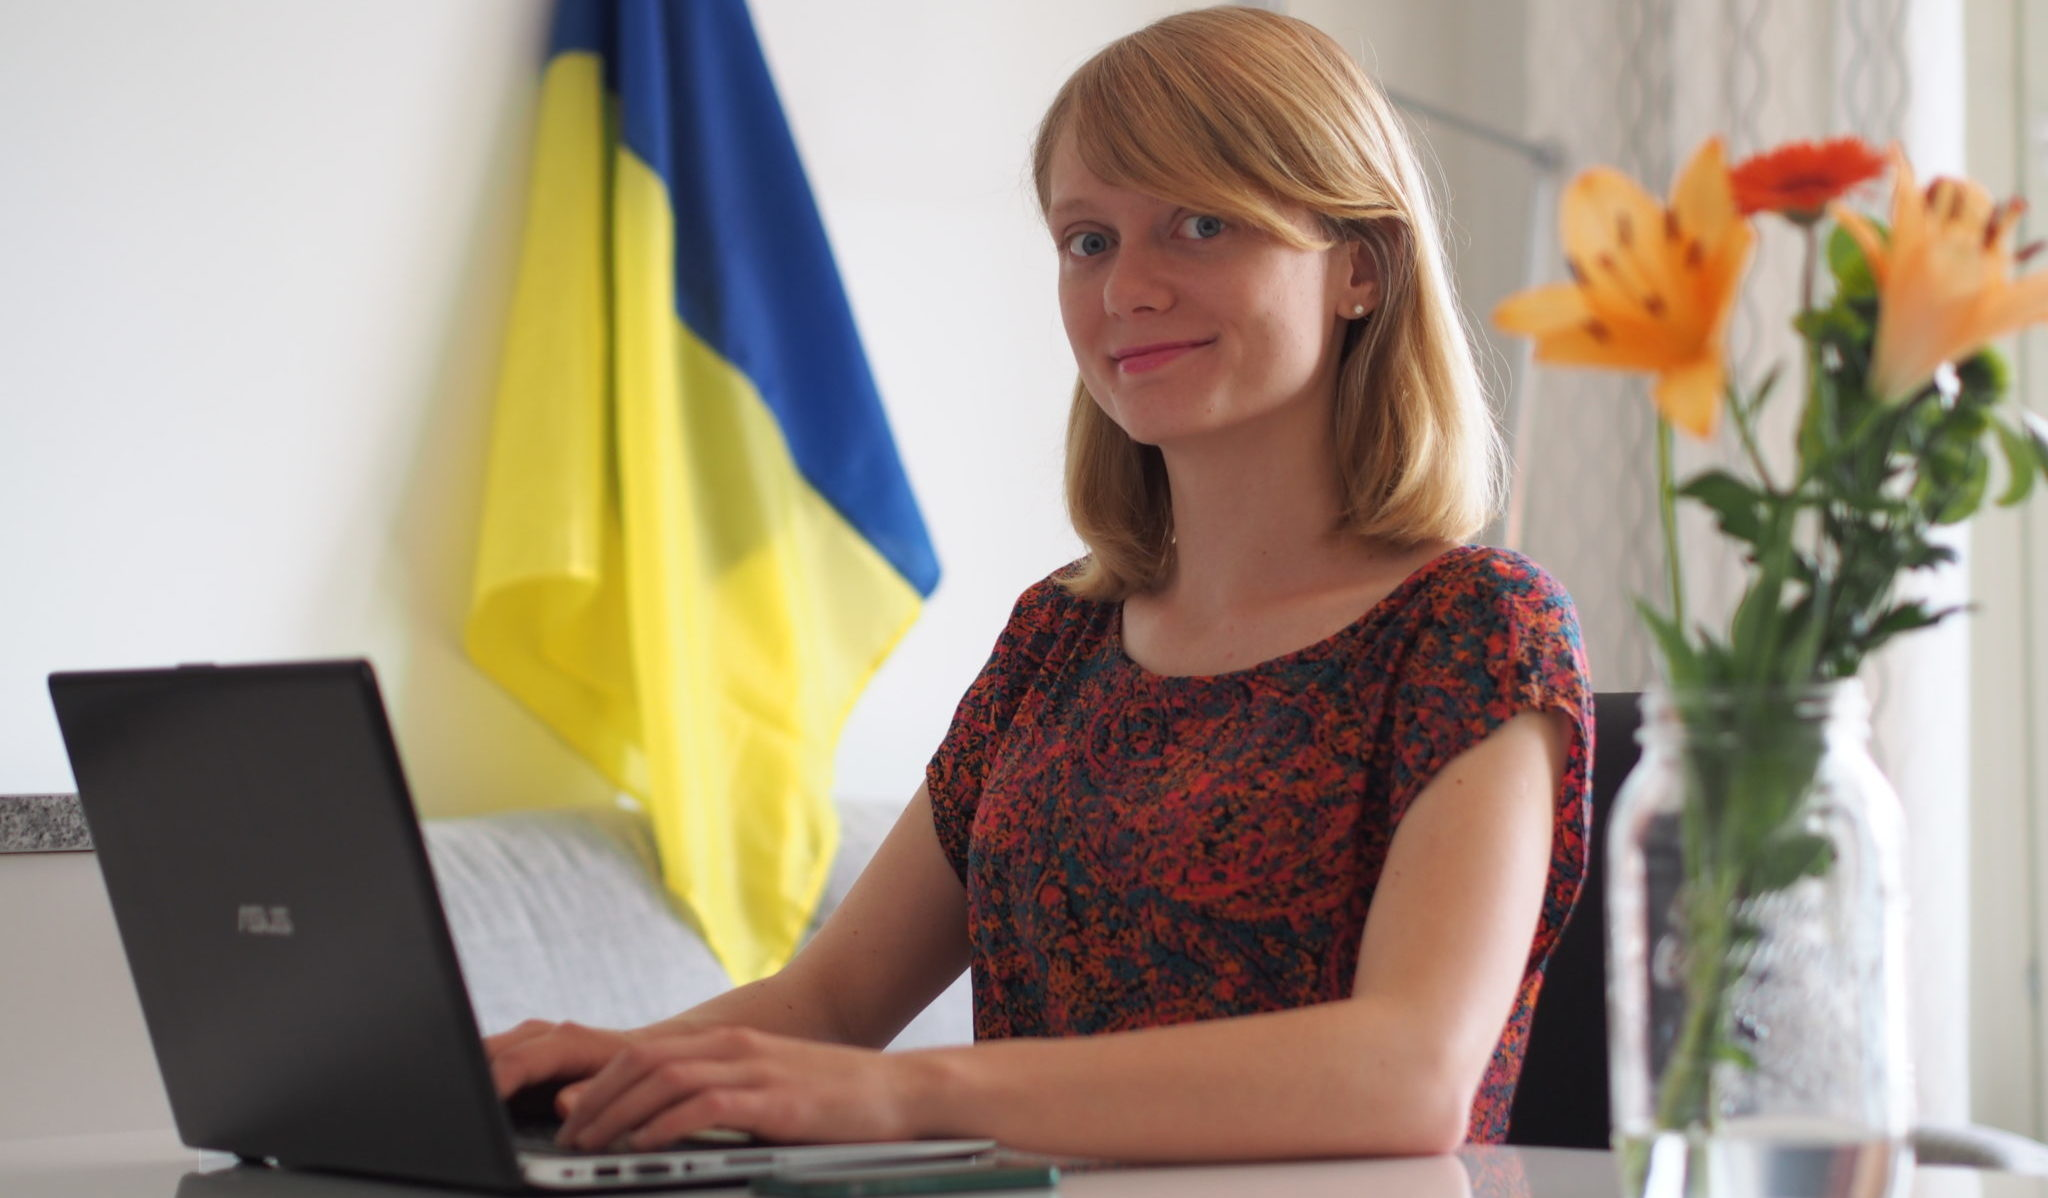 Am ukranian girls may not congratulate, you